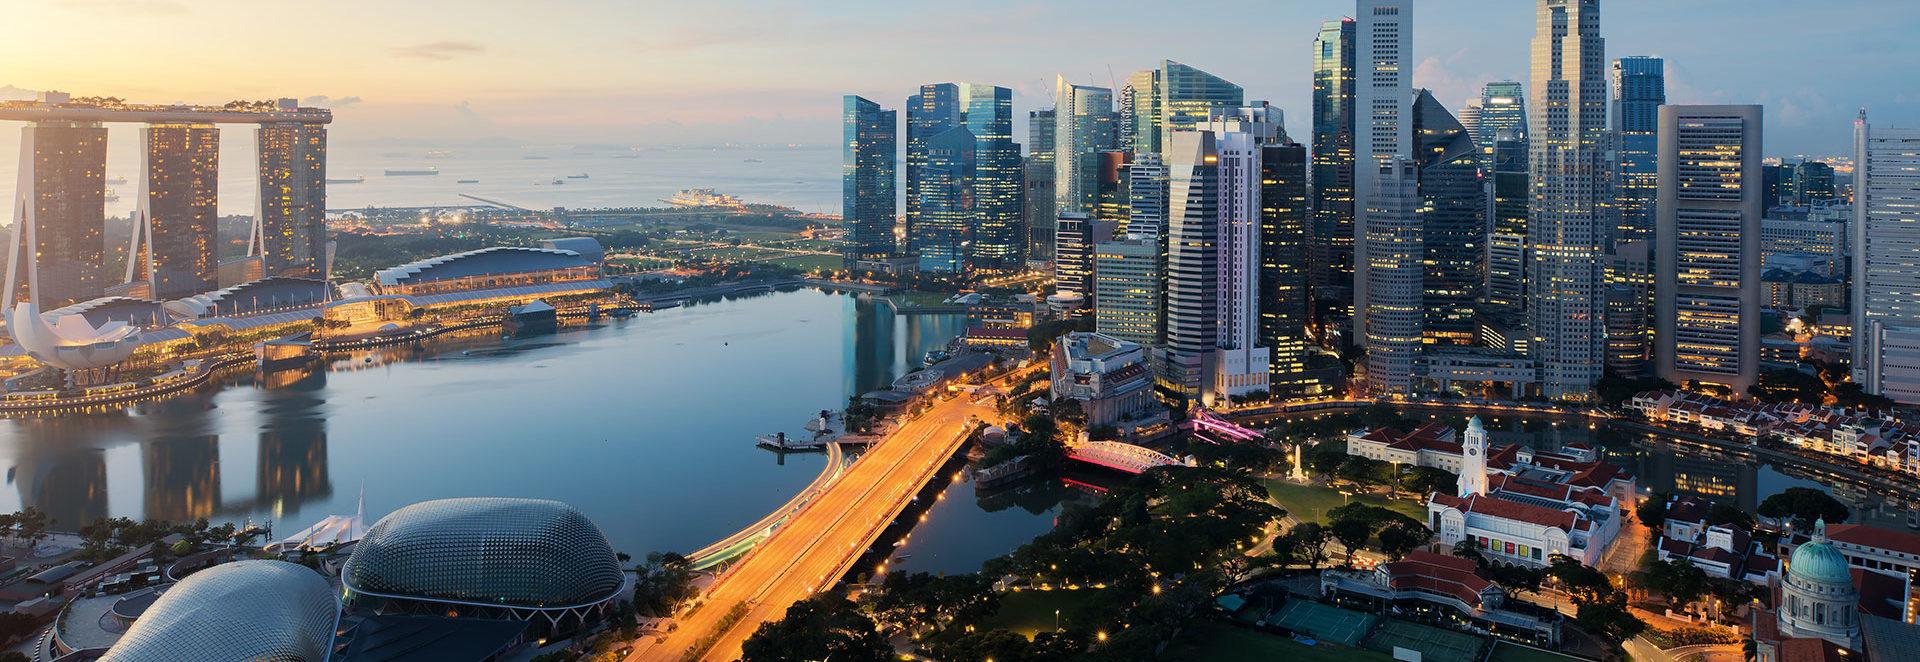 SIngapore skyline clear day